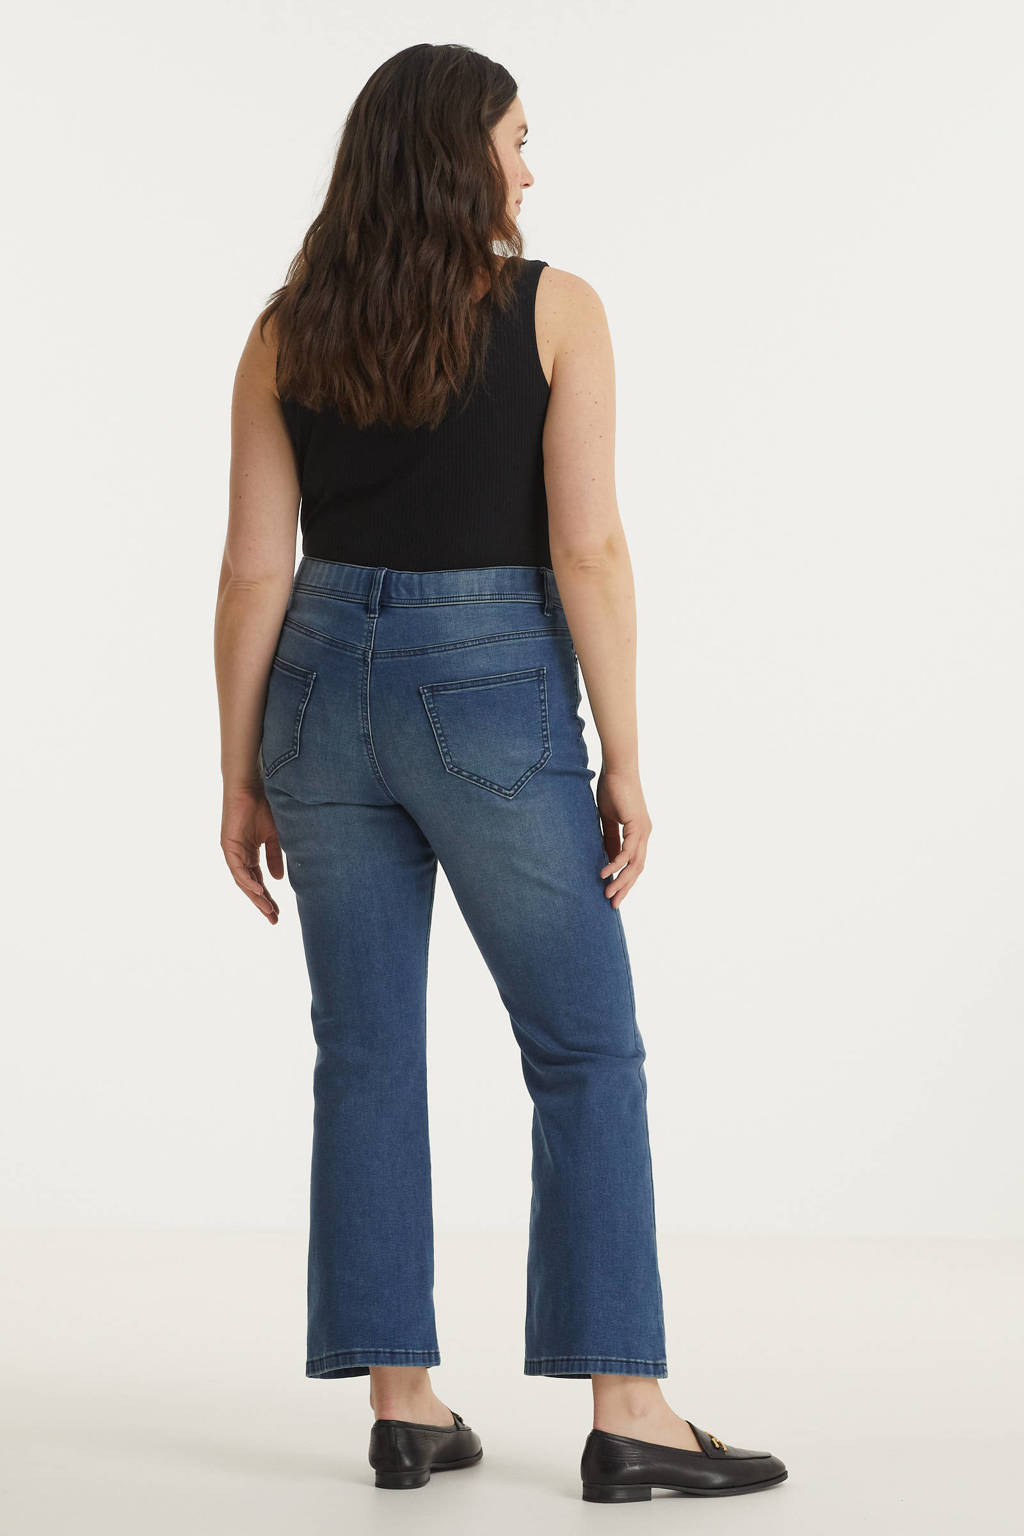 Simply Be bootcut jeans 24/7 medium vintage blue, Medium vintage blue